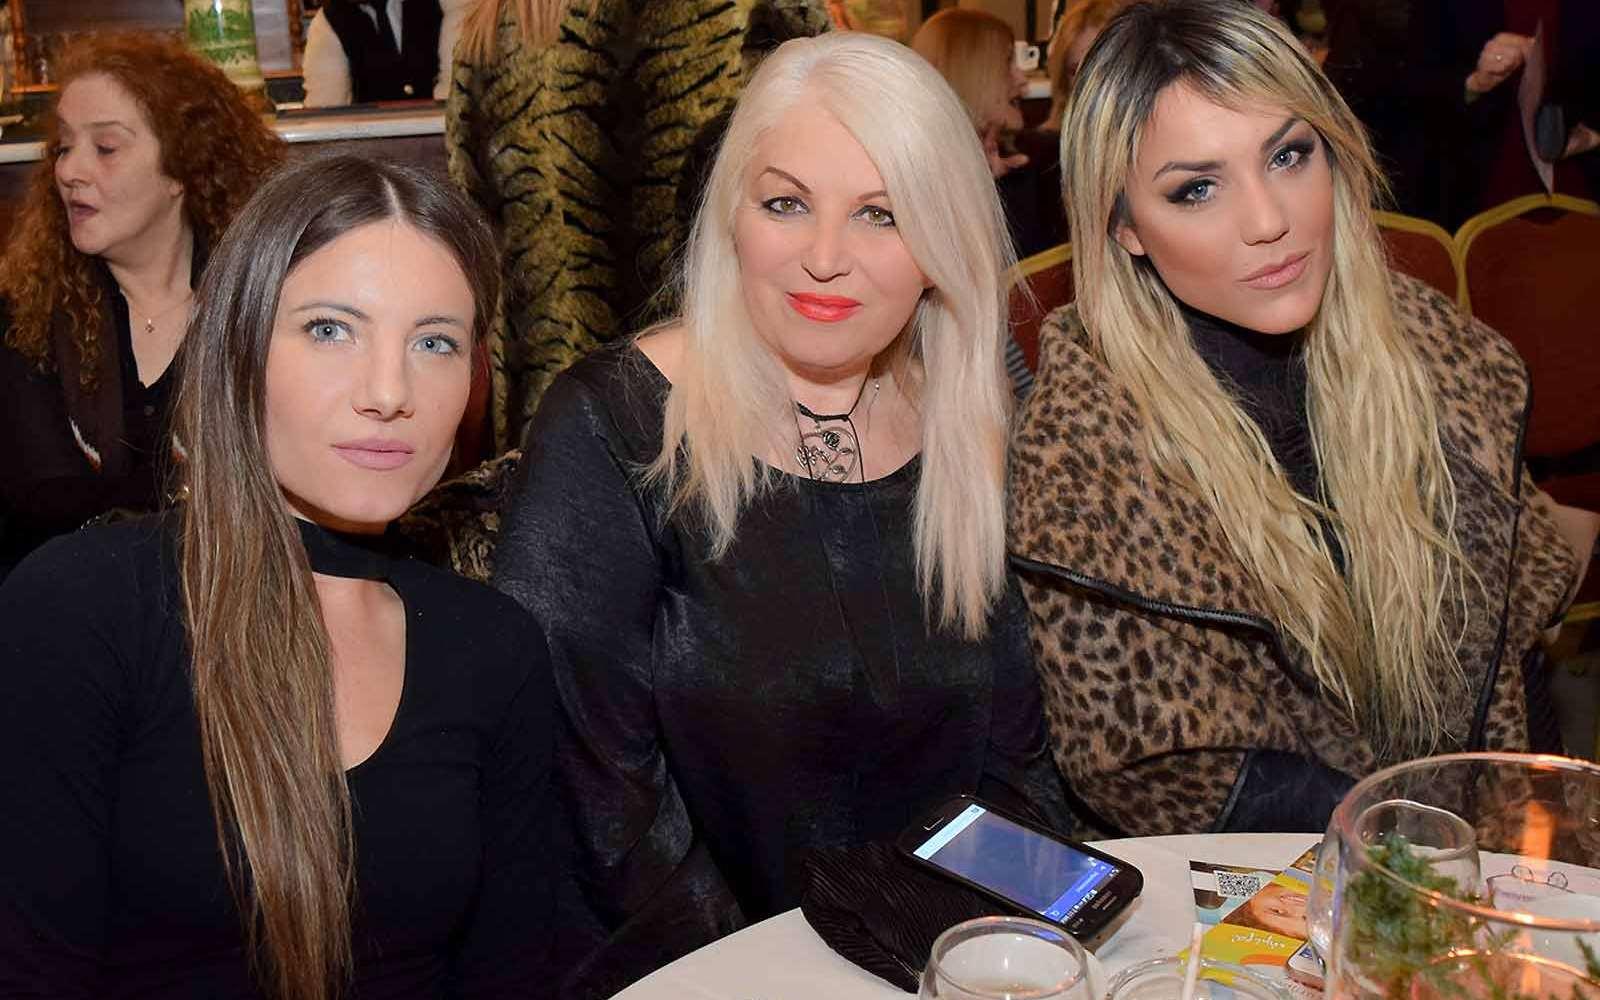 chardavellas_kontogeorgopoulou